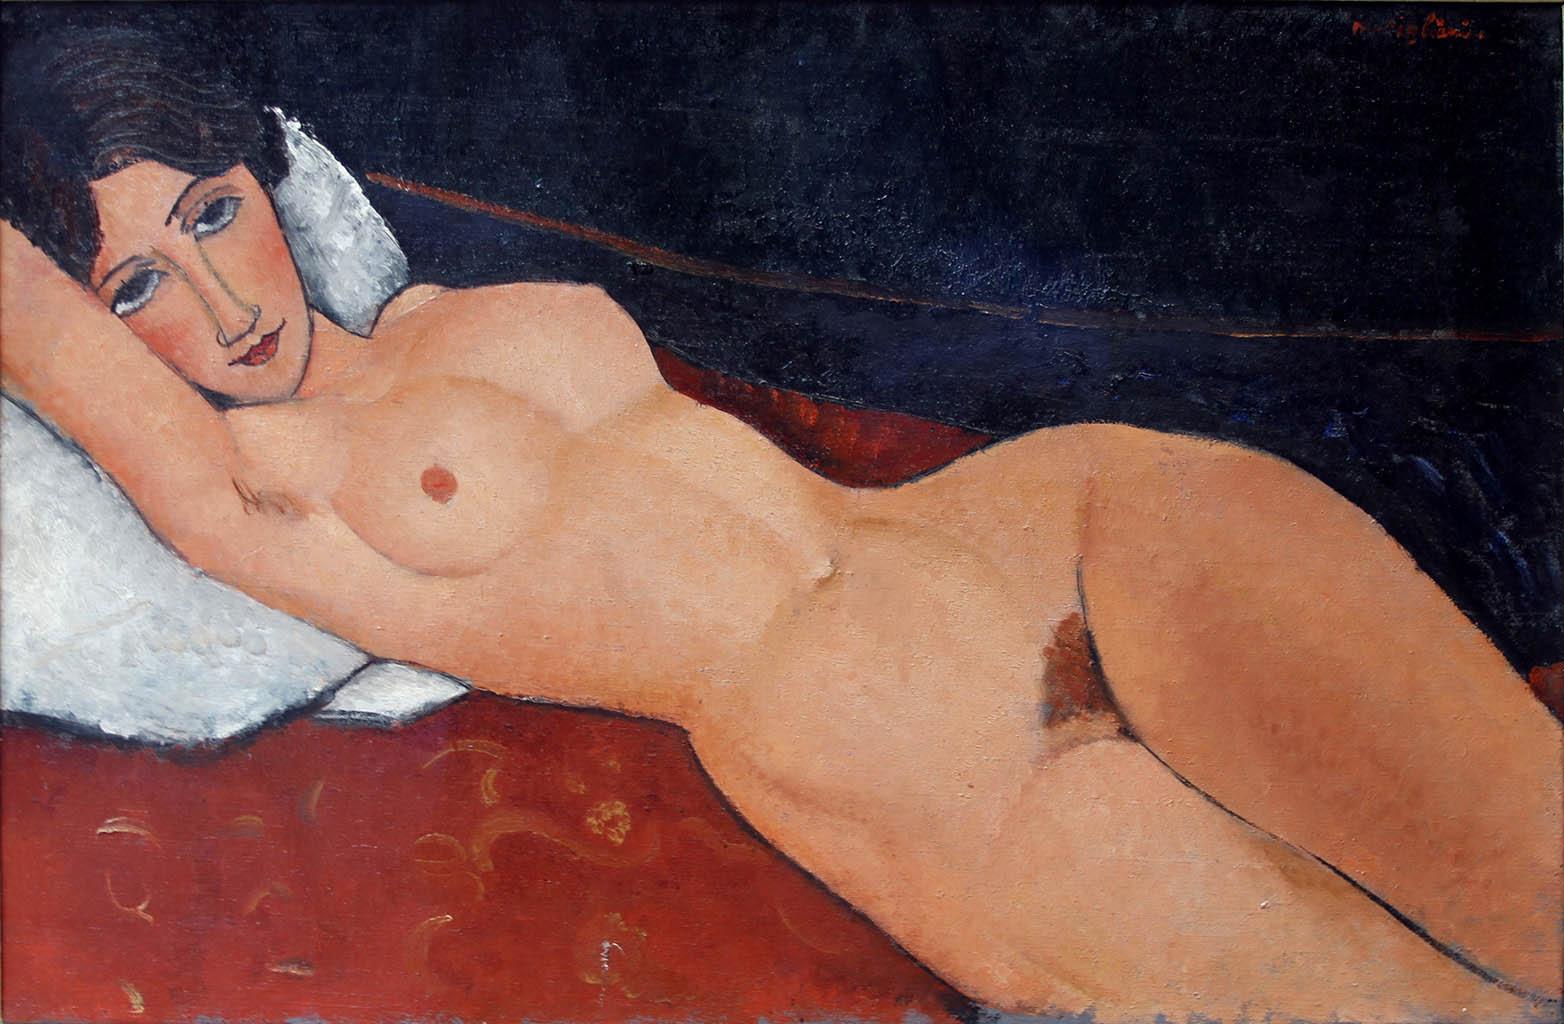 "Амедео Модильяни (Amedeo Modigliani), ""Female Nude Reclining on a White Pillow"""